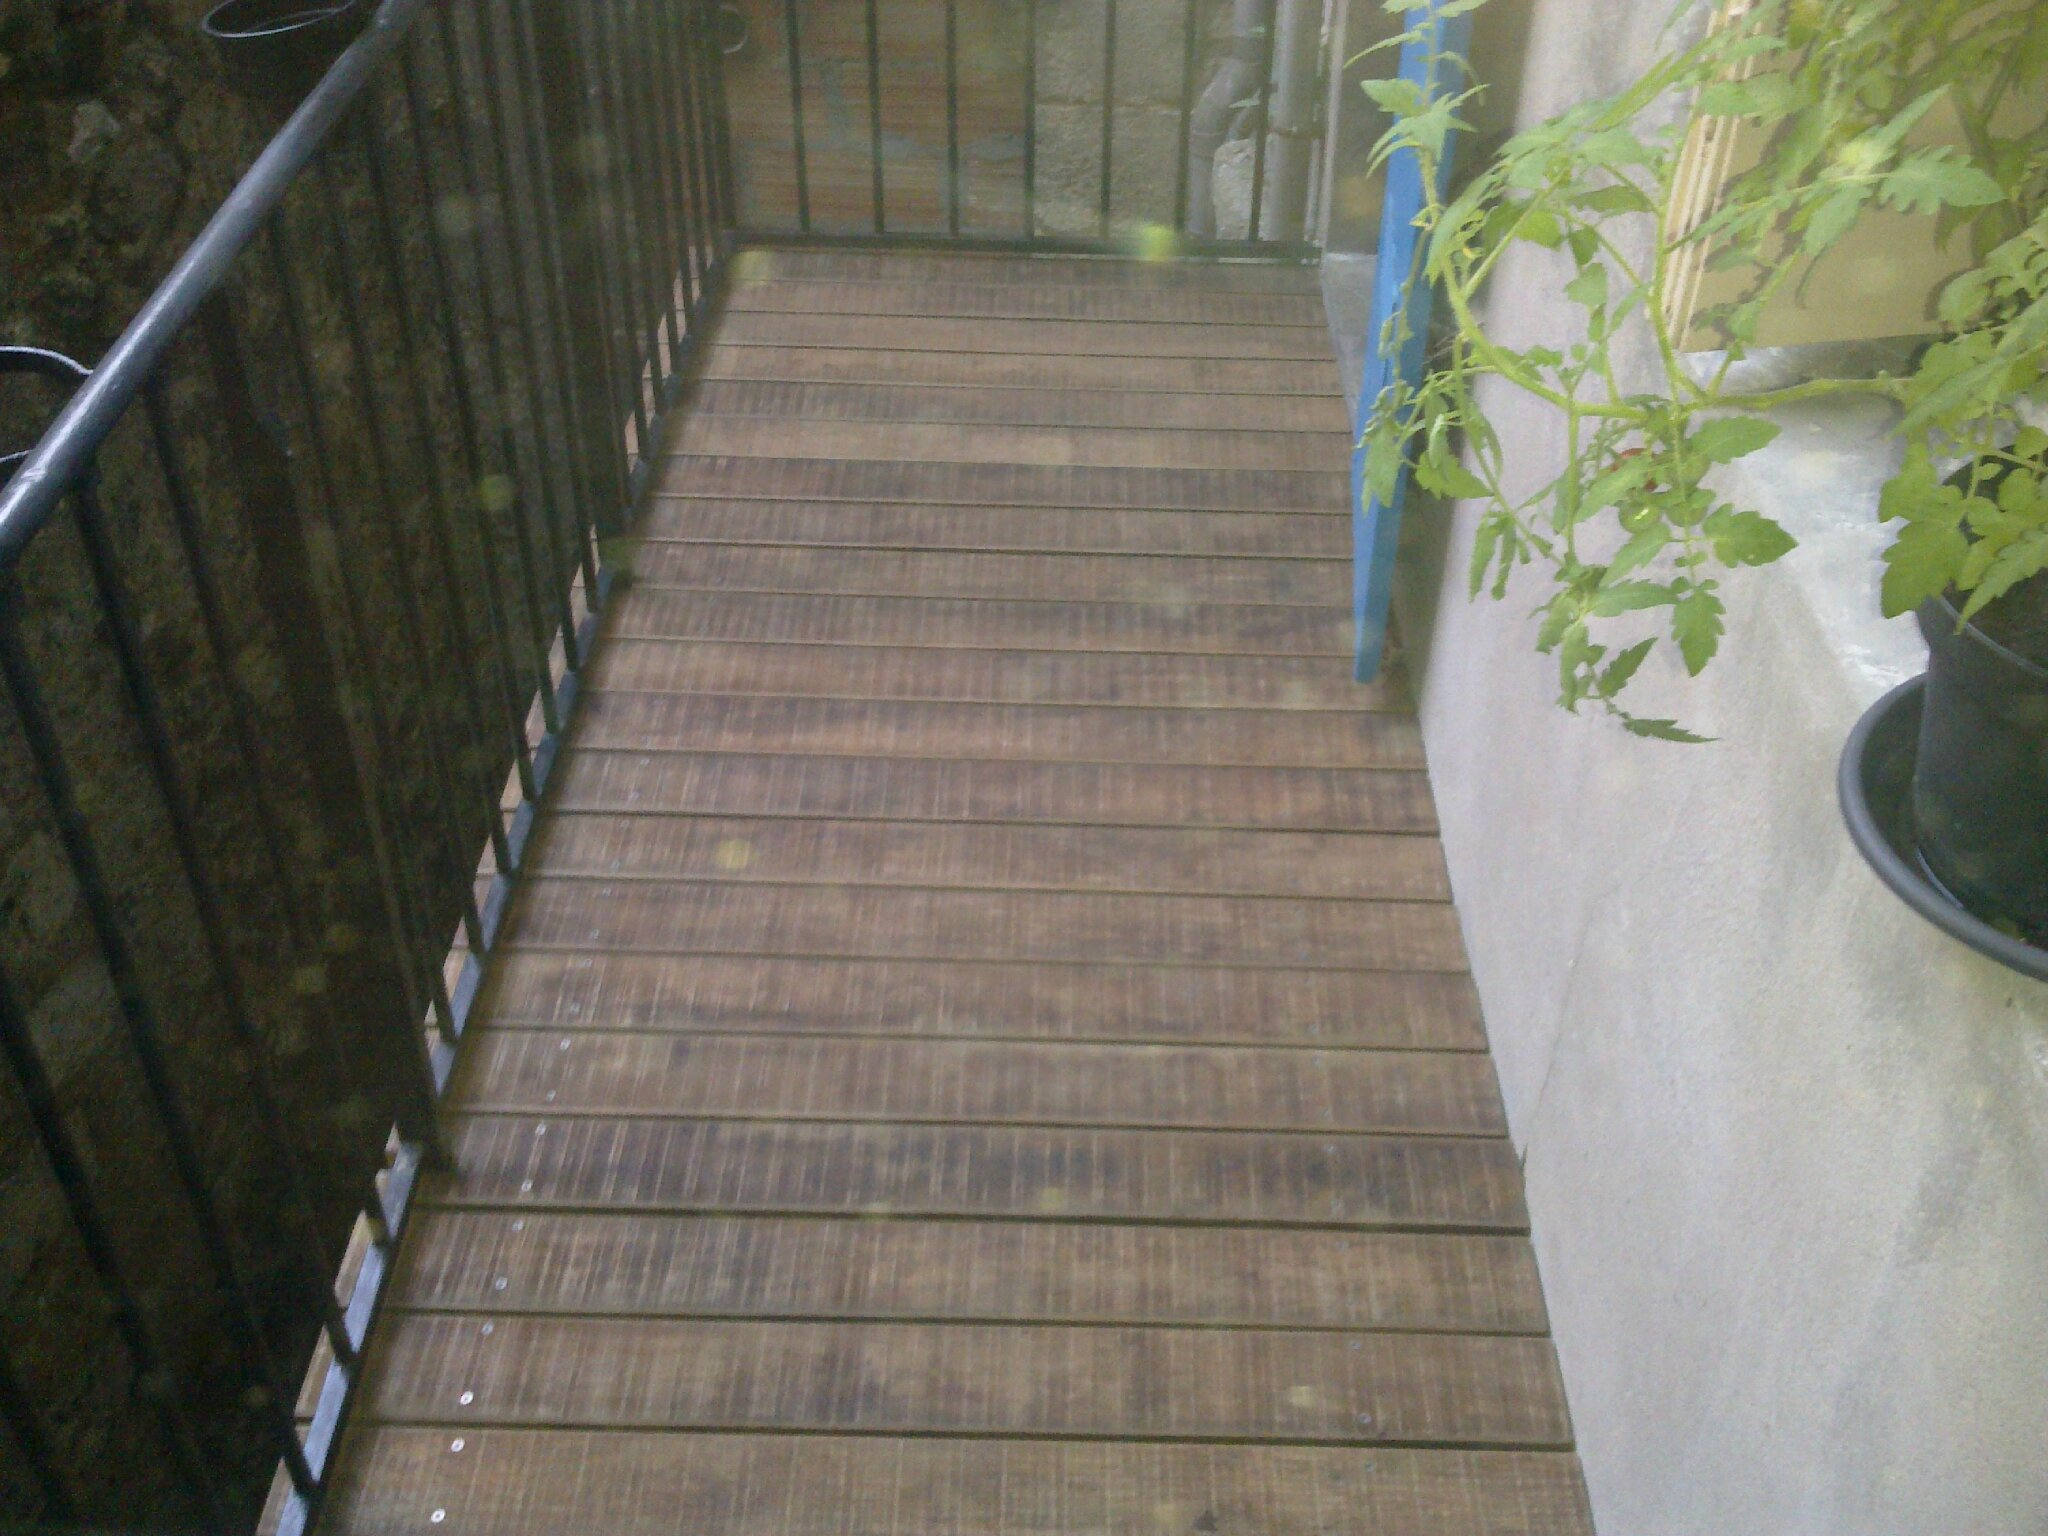 terrasse balcon bordeaux 5m2 album photos frederic emont terrasse. Black Bedroom Furniture Sets. Home Design Ideas